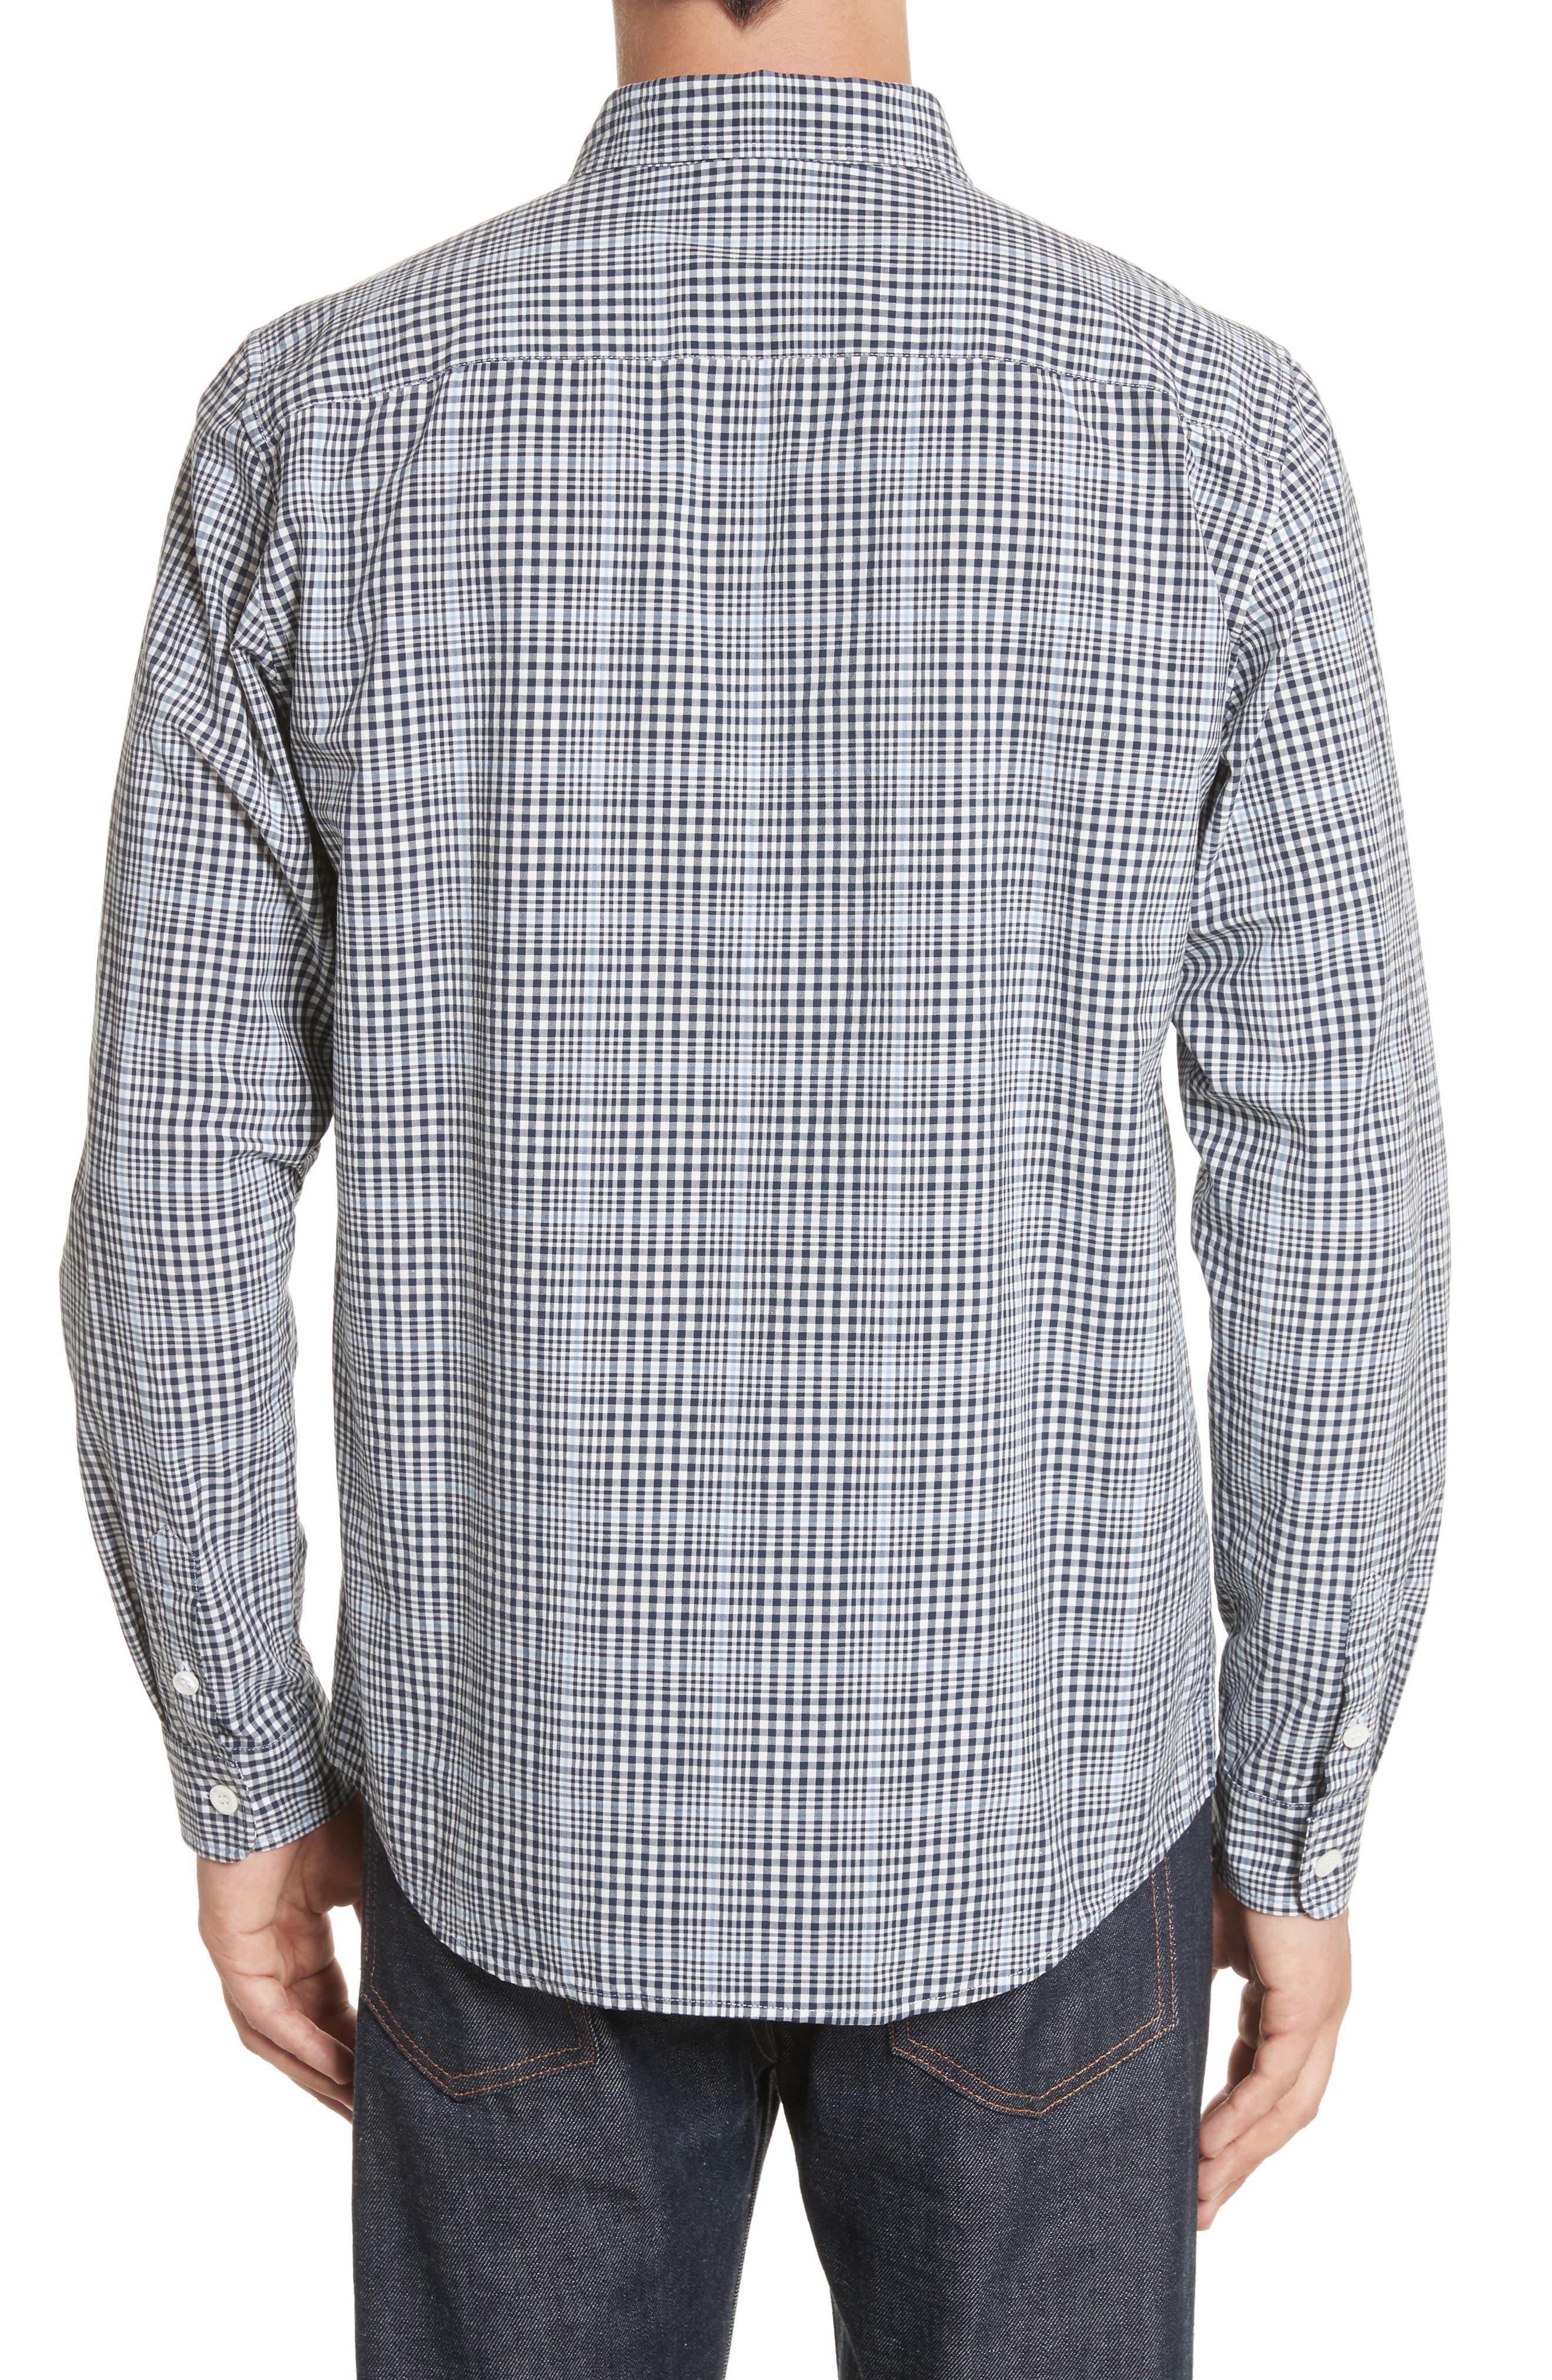 Alternate Image 2  - A.P.C. John Check Woven Shirt